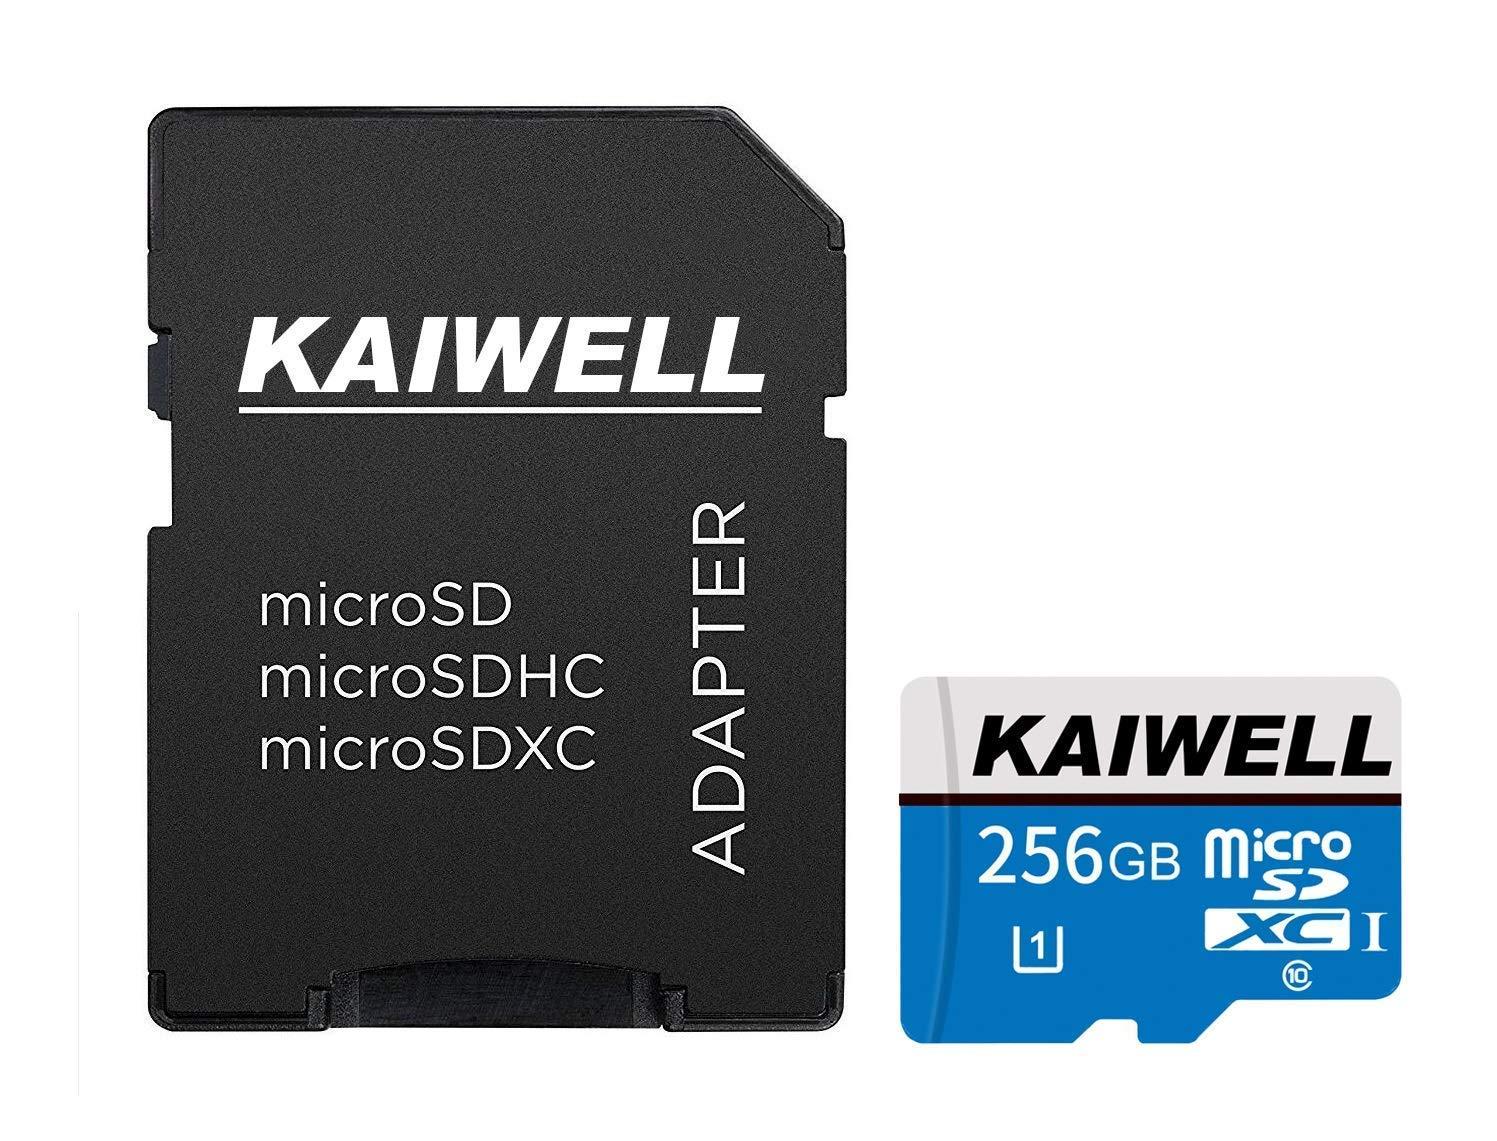 KAIWELL Micro-SD-Karte 256 GB 128 GB//256 GB//400 GB, High Speed, Class 10, SDXC, mit Adapter